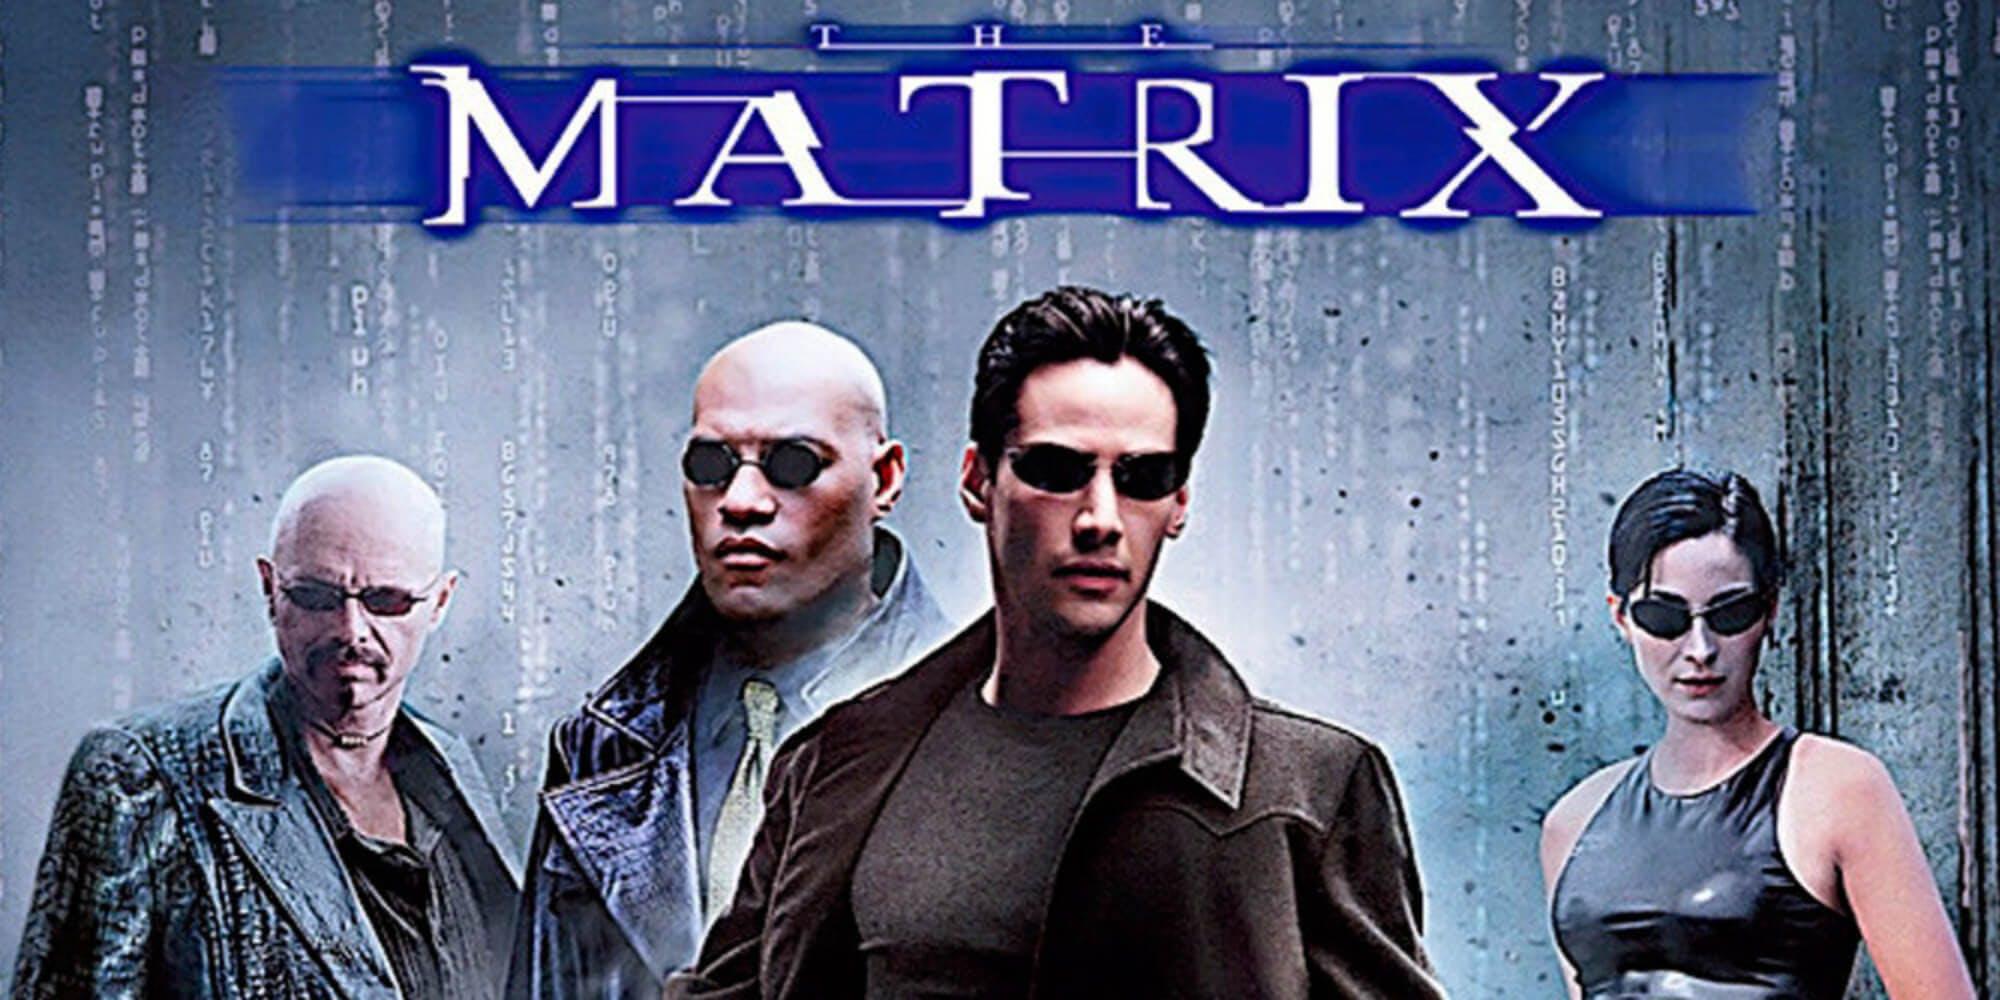 keanu reeves movies netflix the matrix